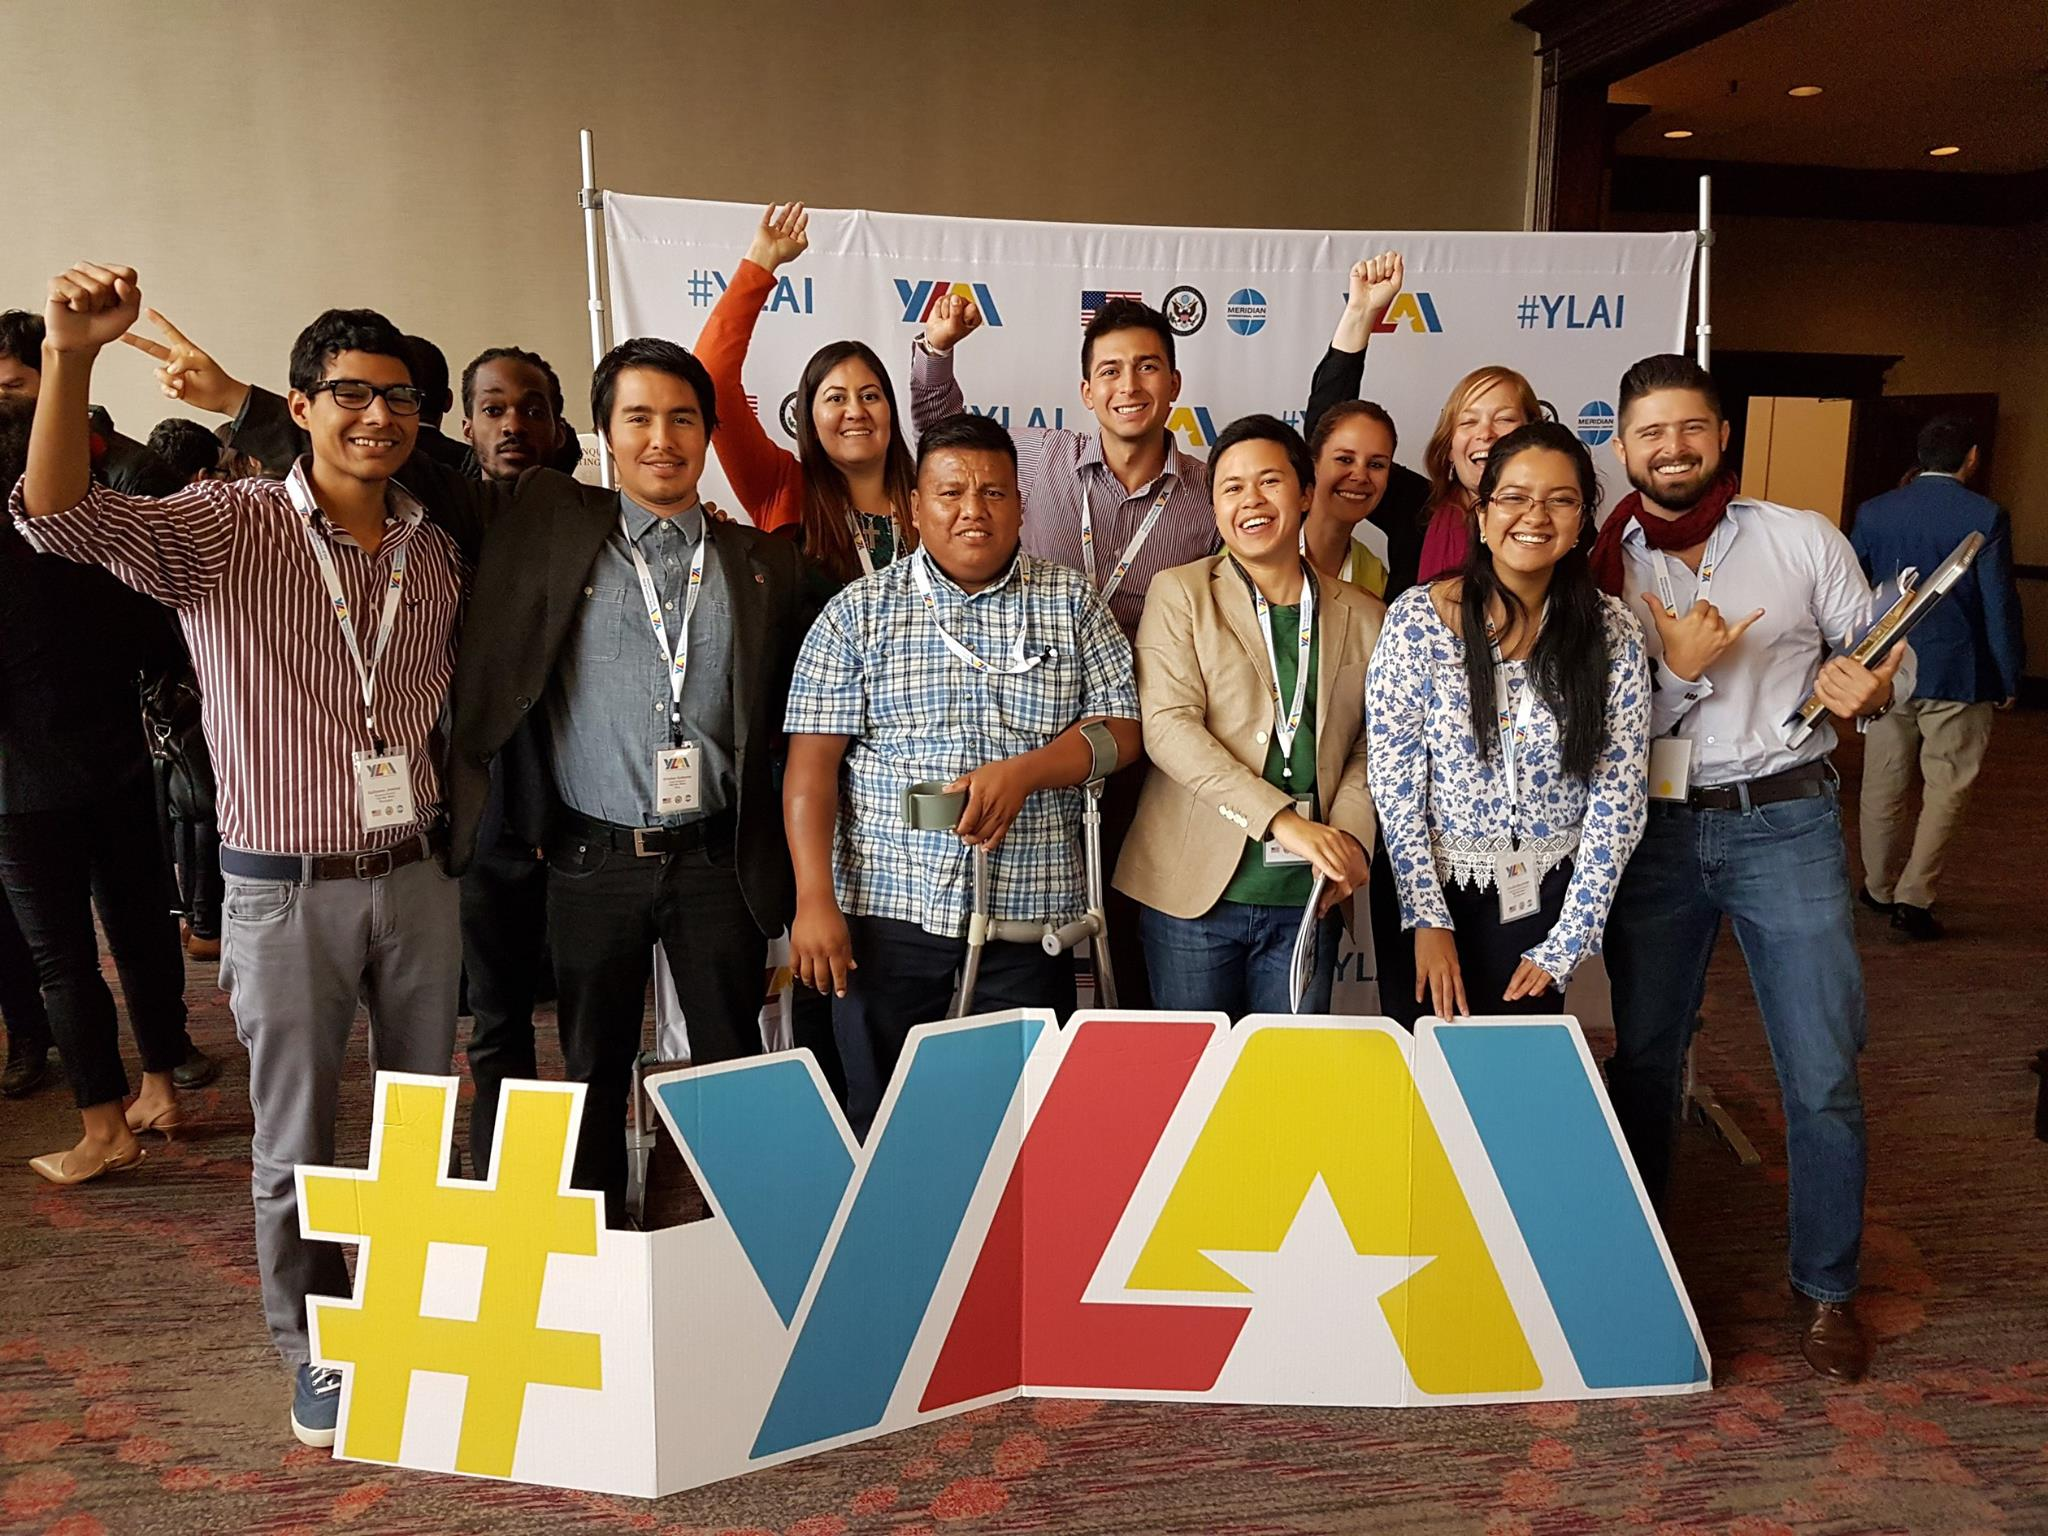 yali participants